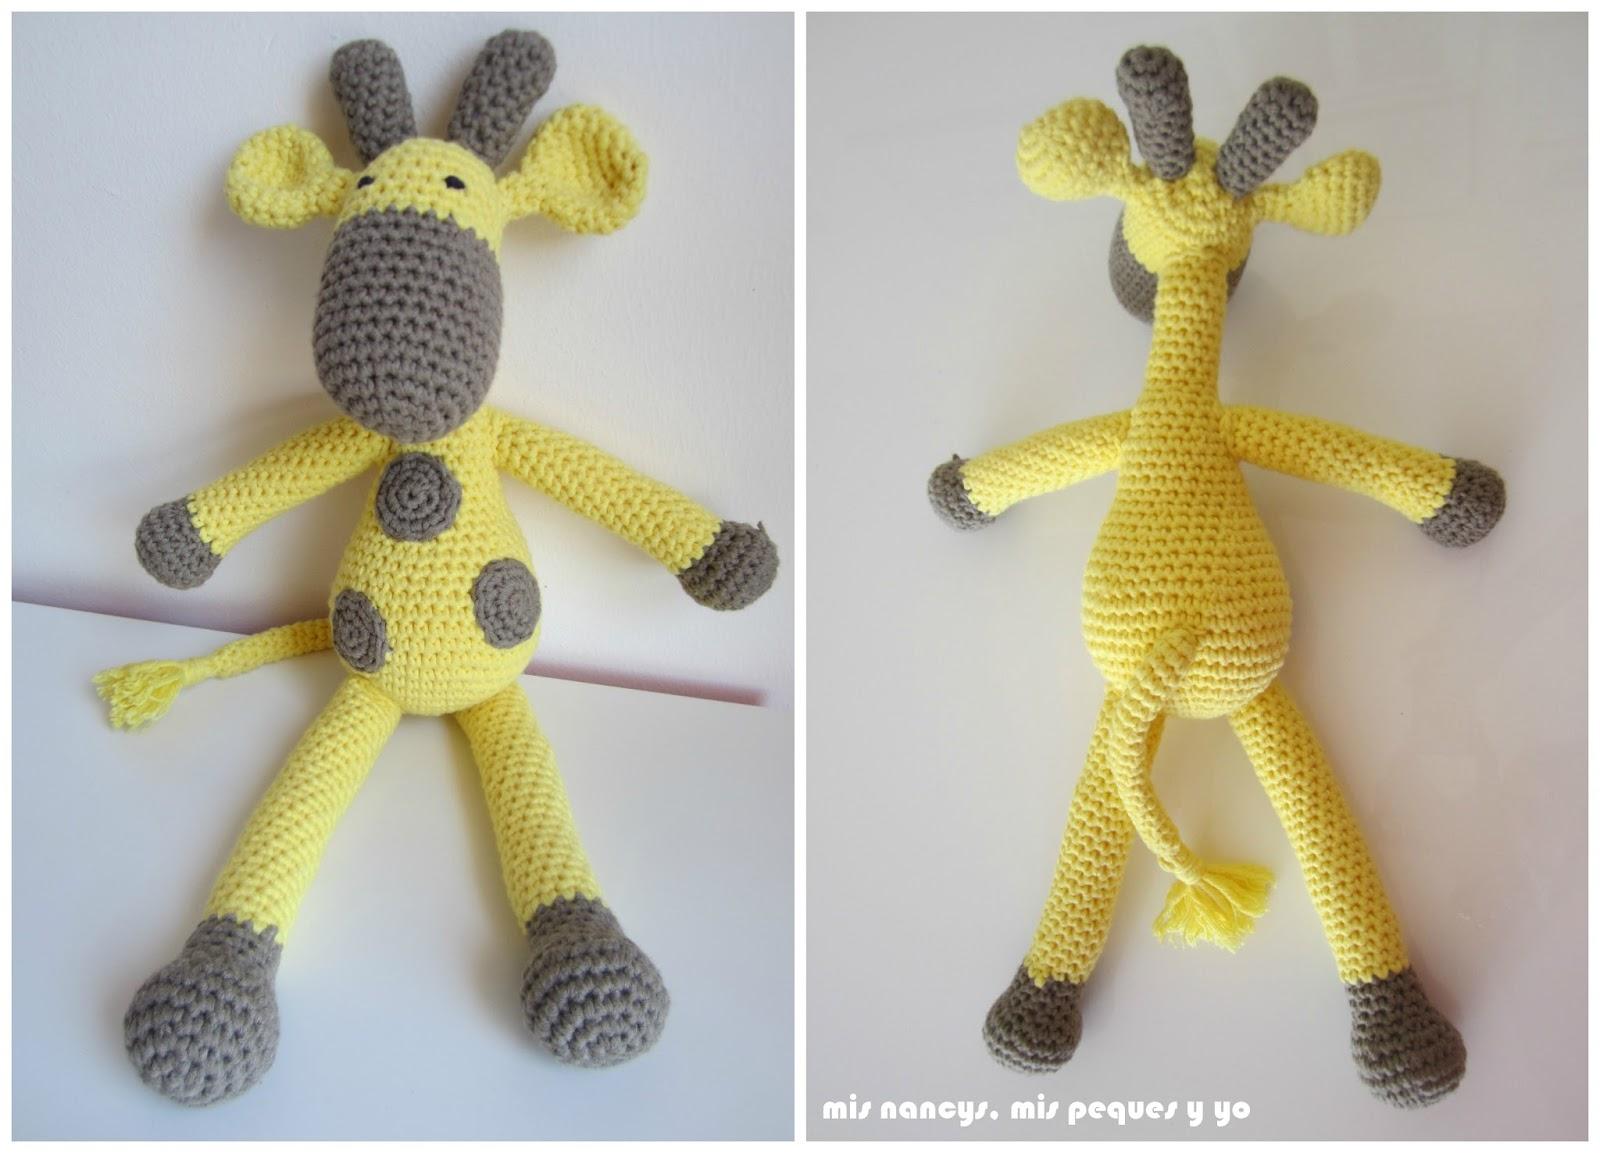 Llavero de jirafa de crochet, jirafa de crochet, amigurumi de ... | 1153x1600